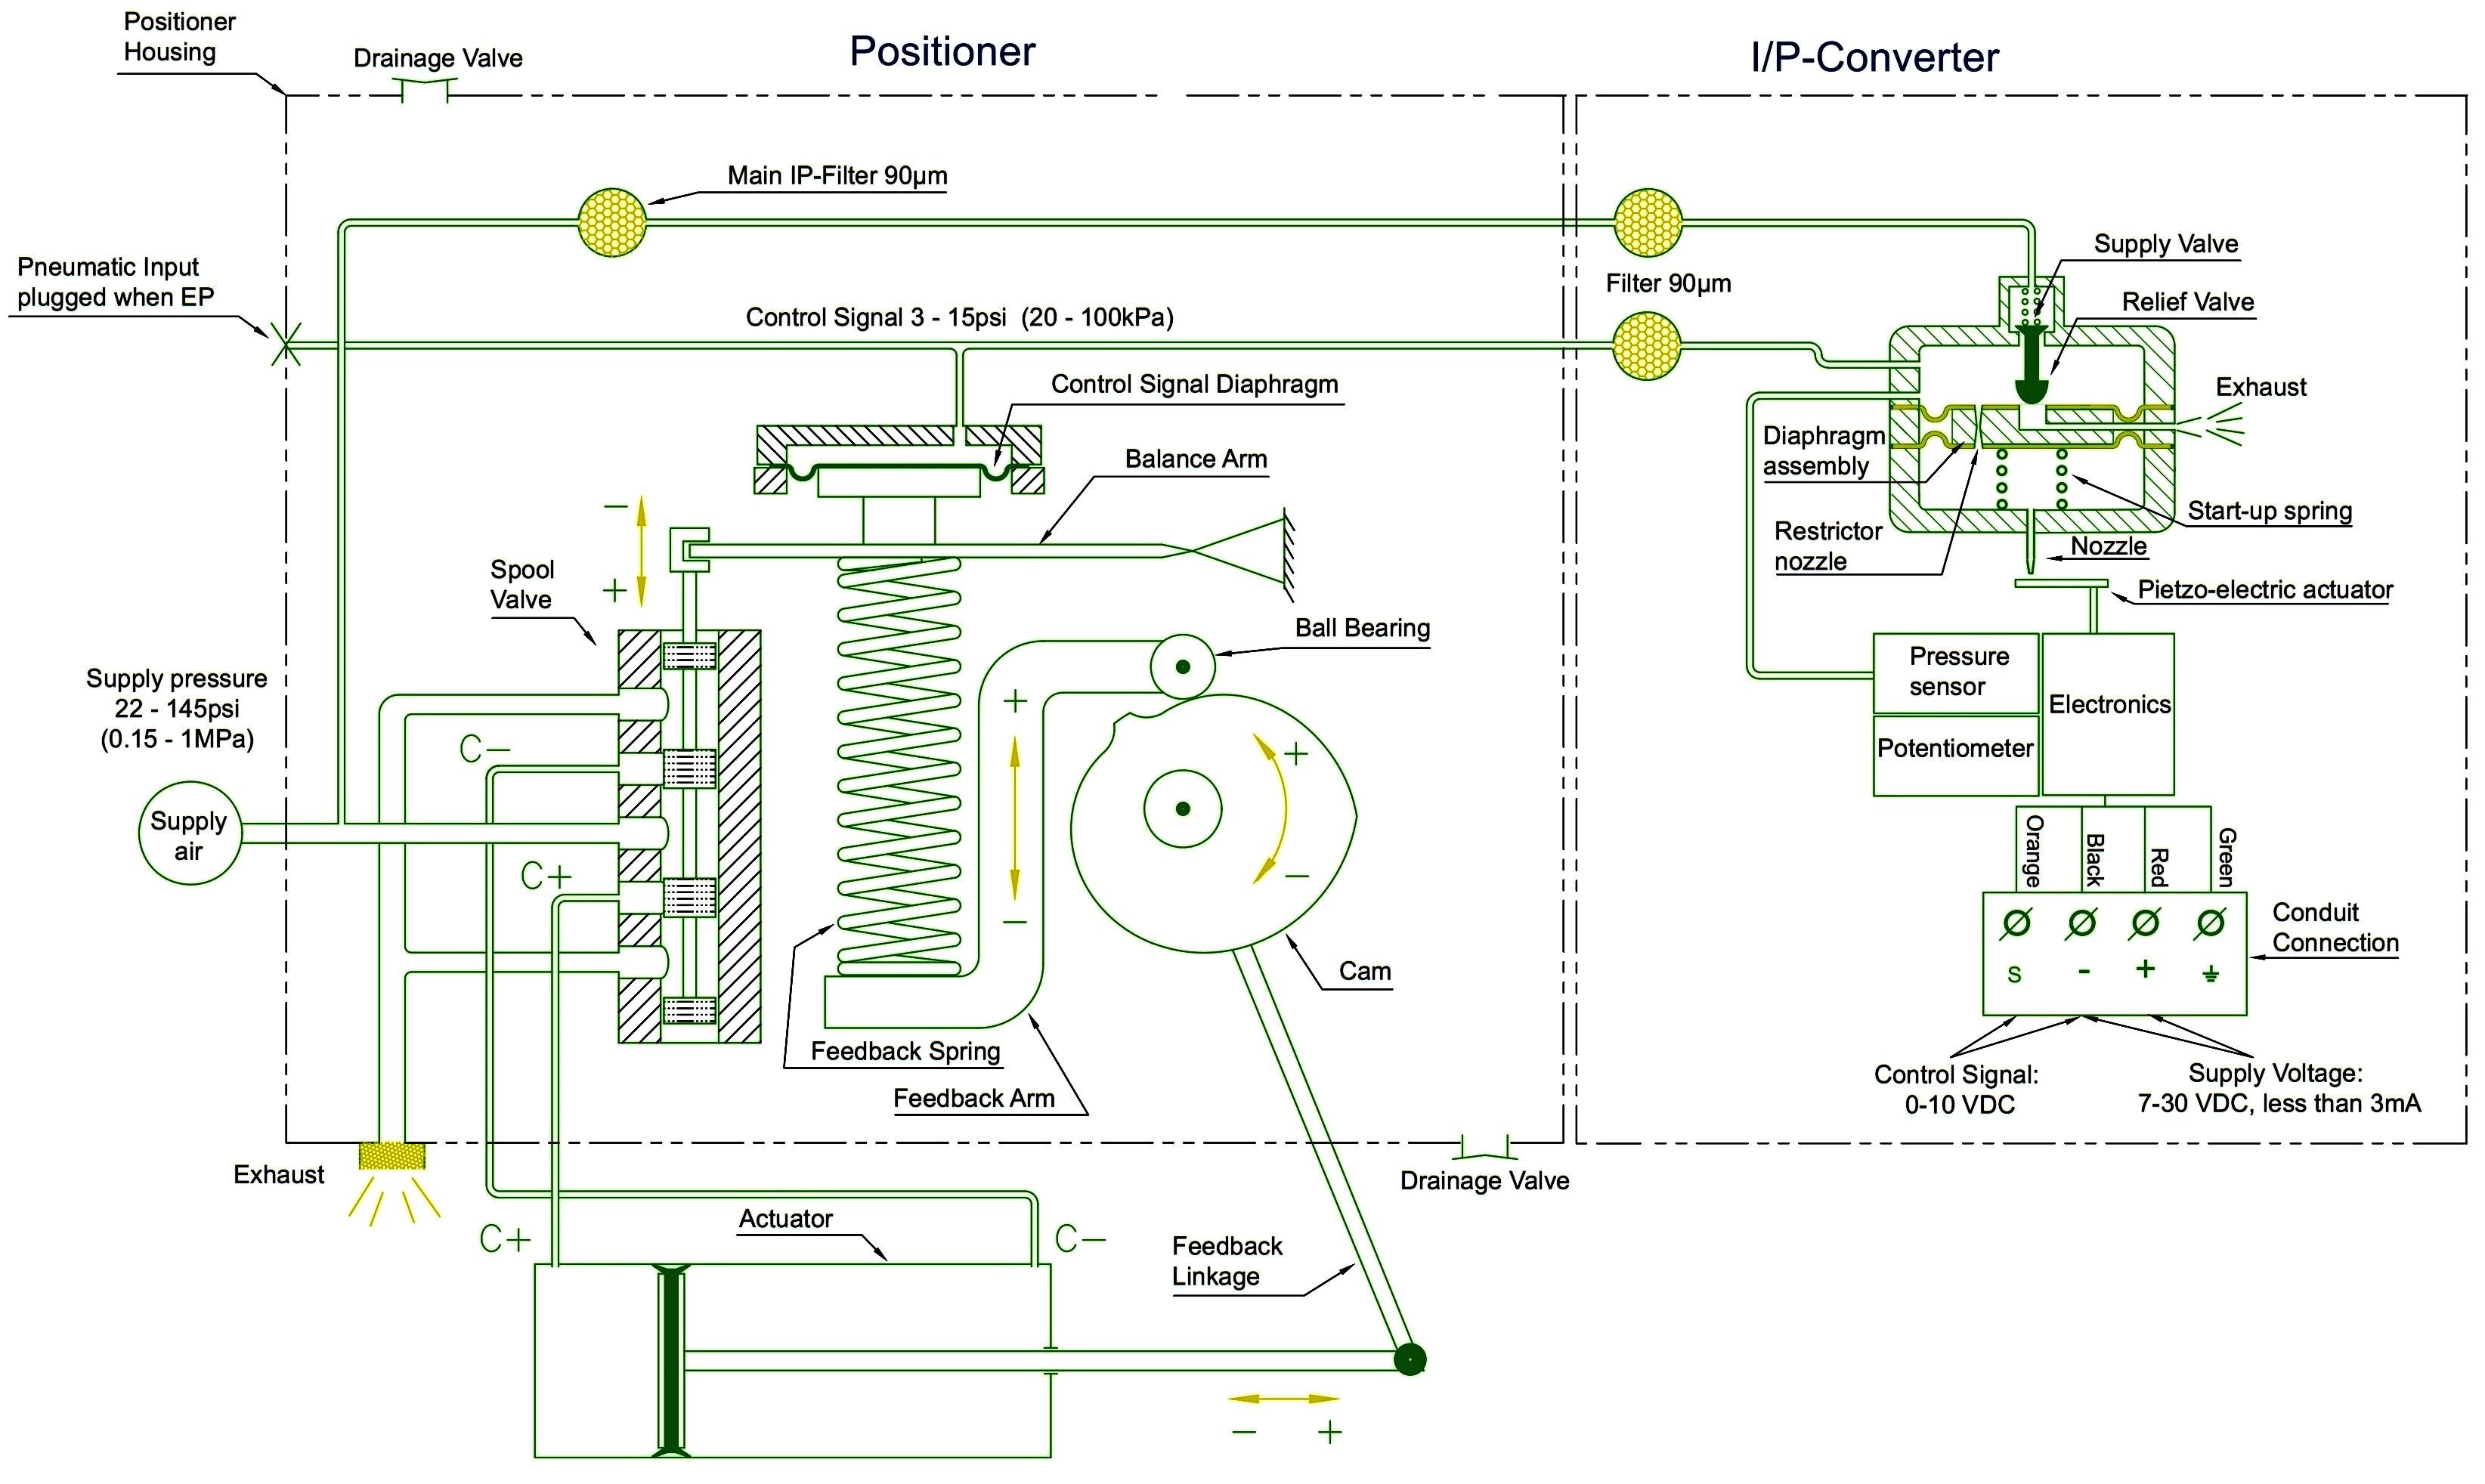 Electropneumatic Valve Positioner Schematic & Principle • VRCValve Related Controls